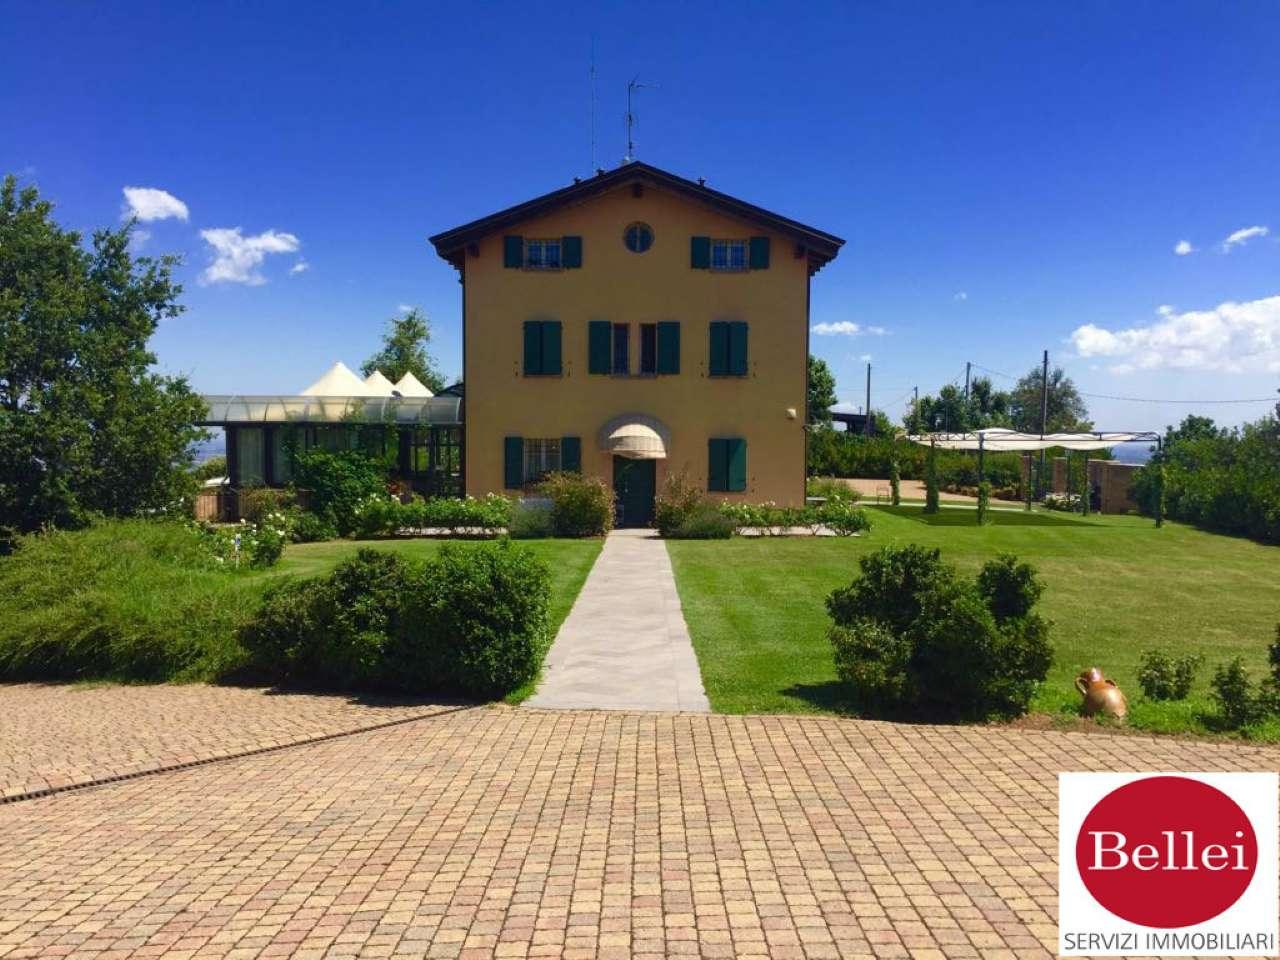 Villa Bifamiliare in Vendita a Casalgrande